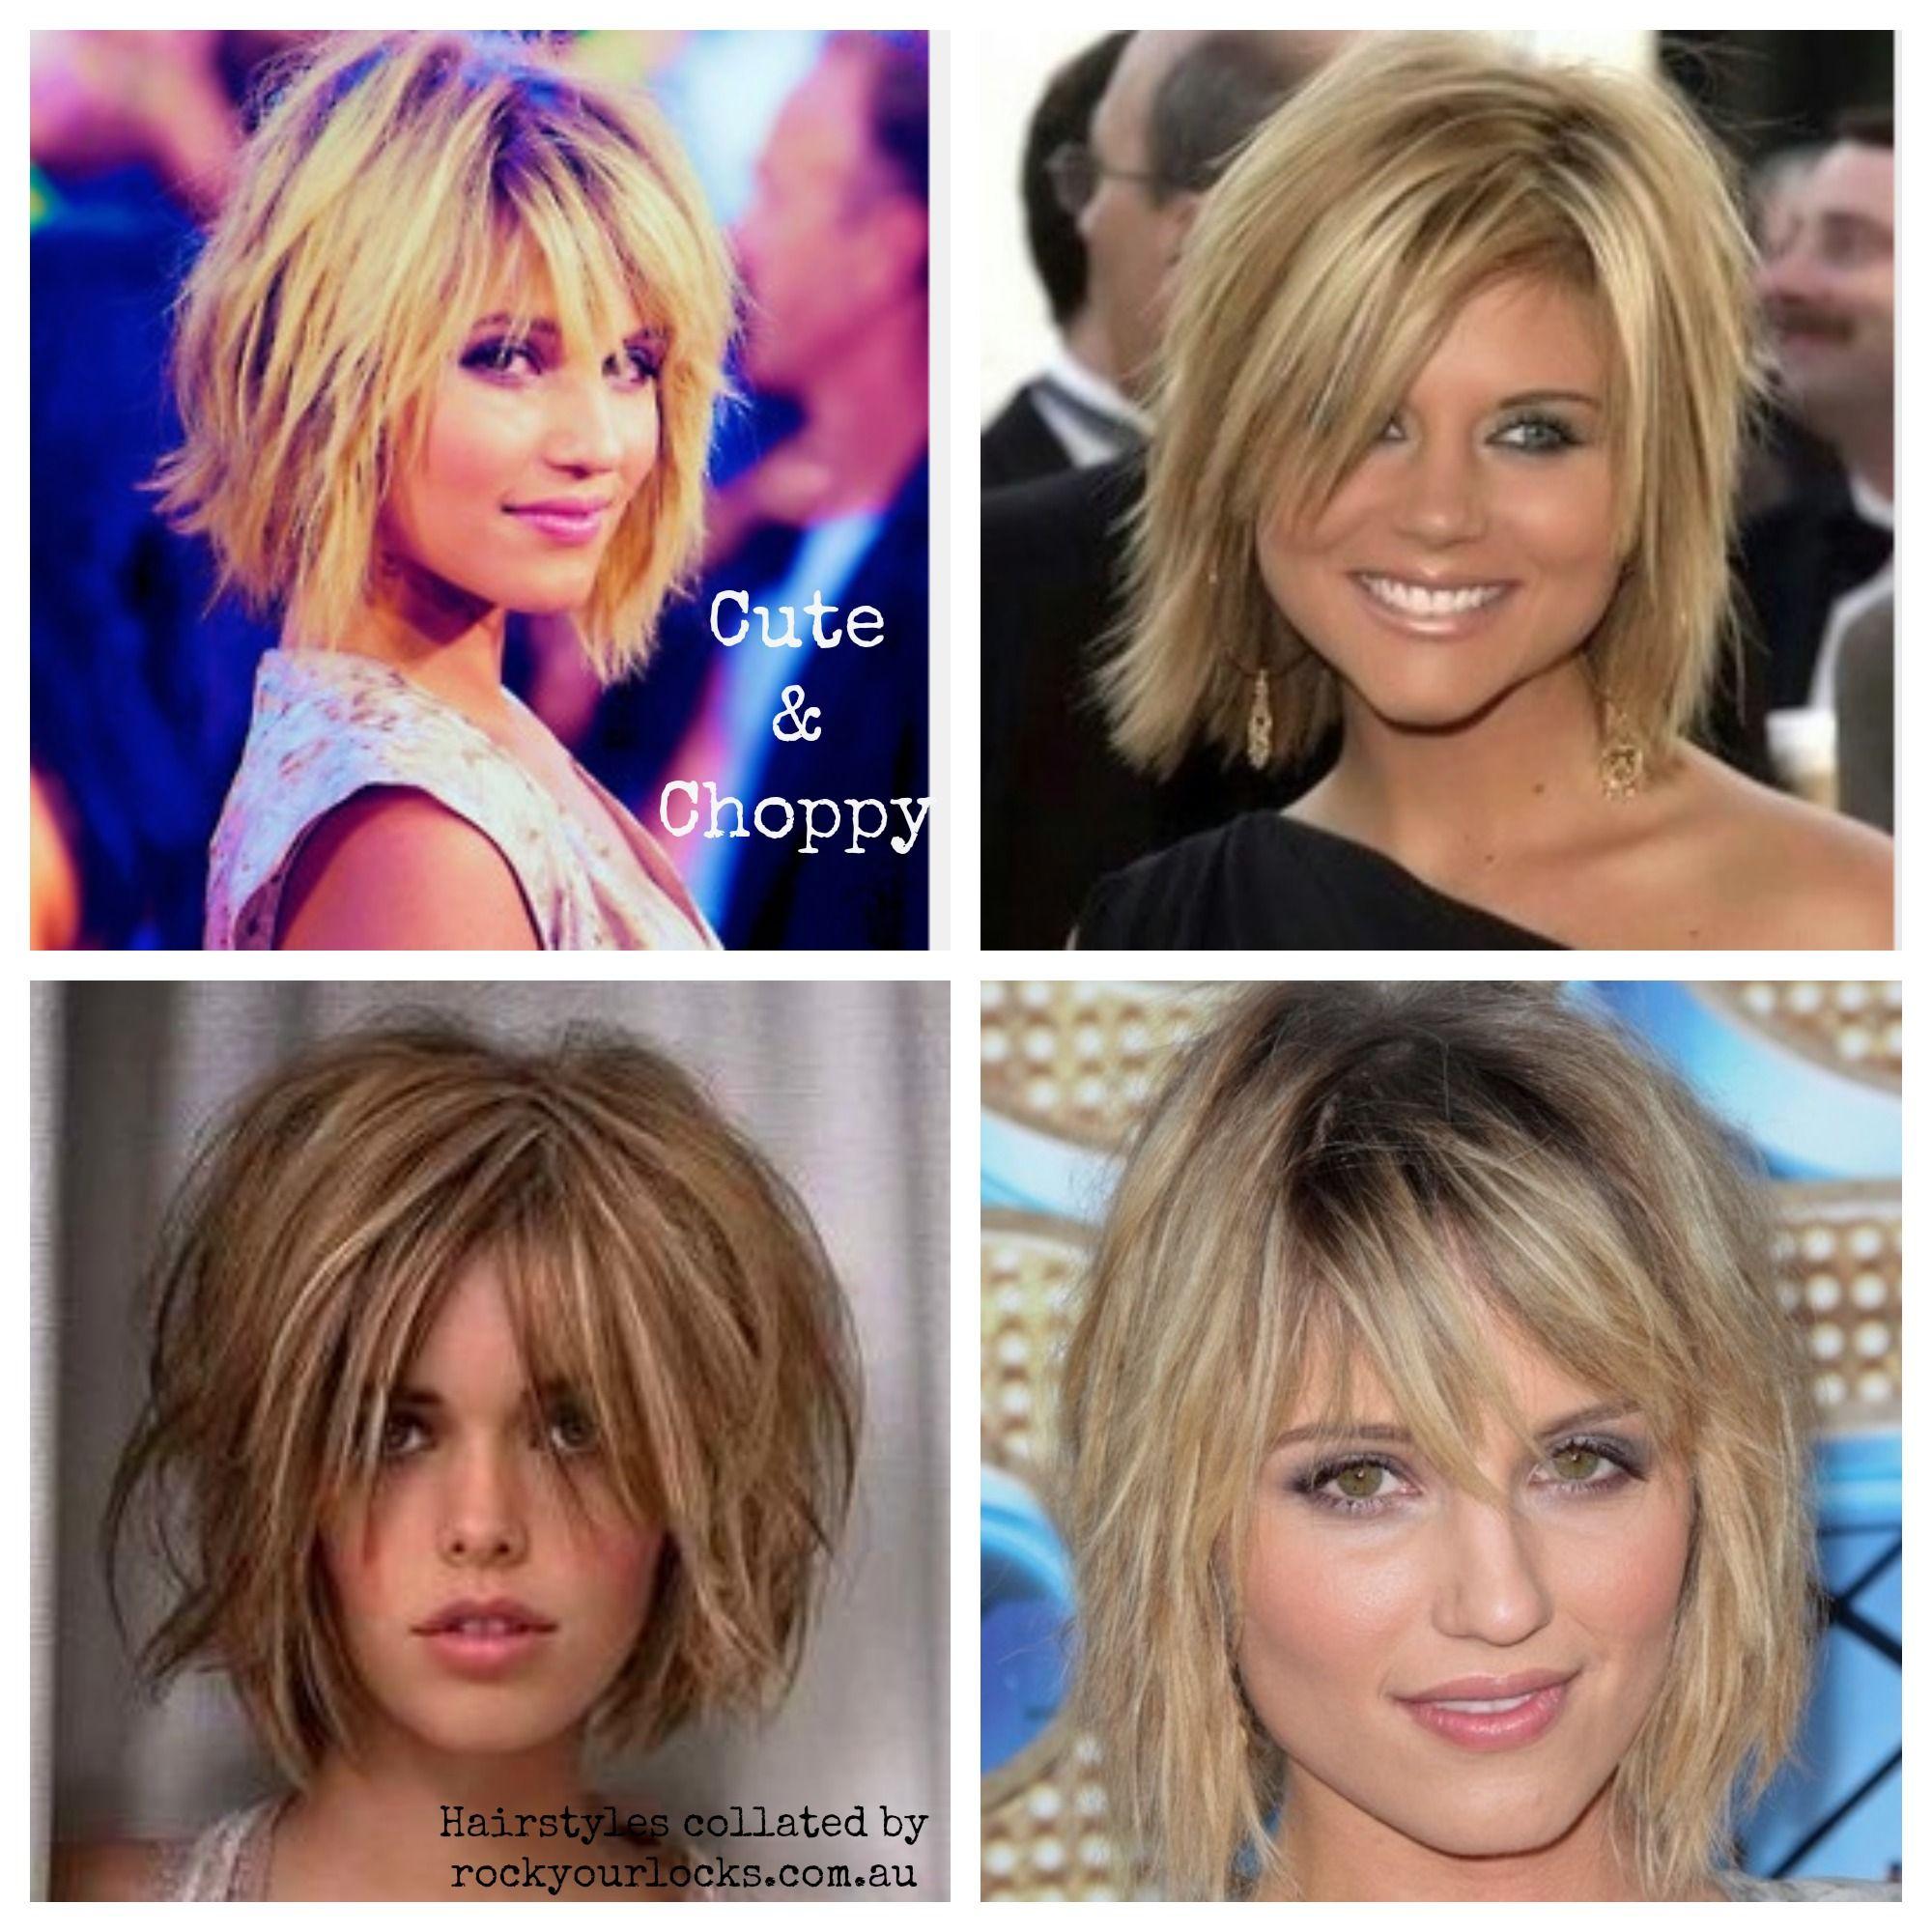 Medium Length Hairstyles - Cute and choppy hairstyles